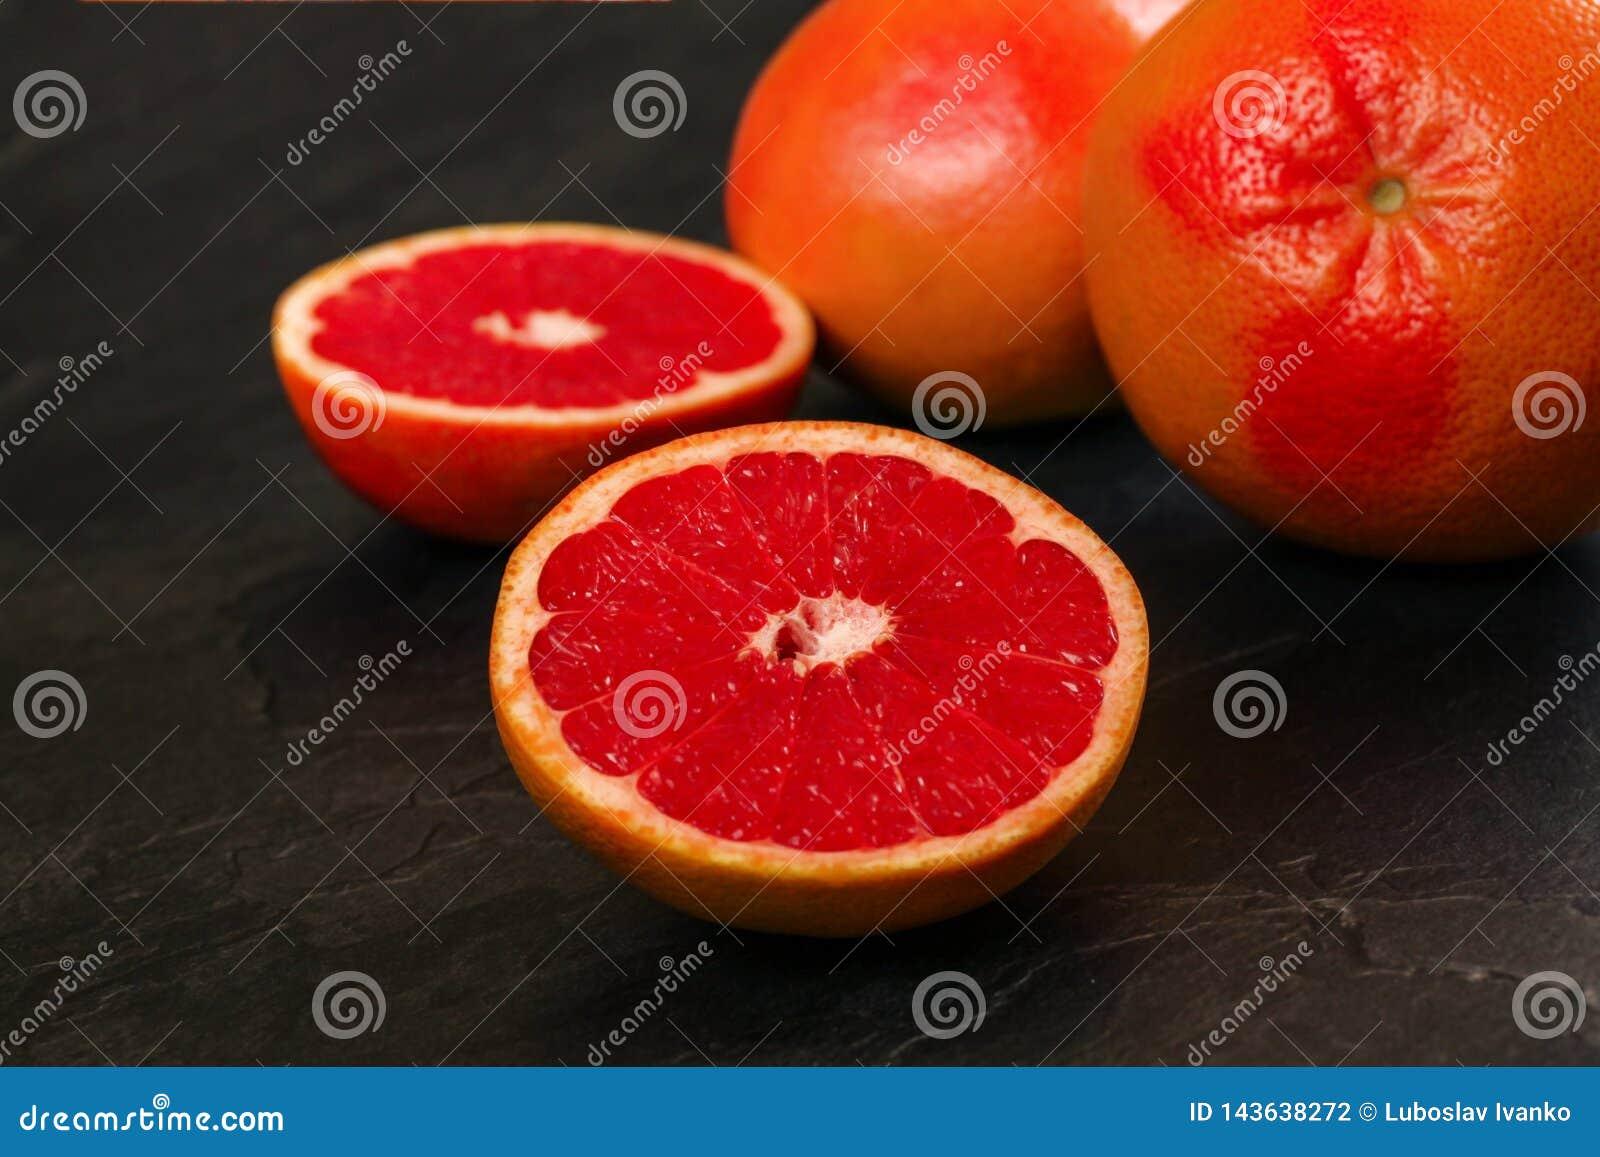 Detail of red grapefruit one citrus halved, on black slate like board